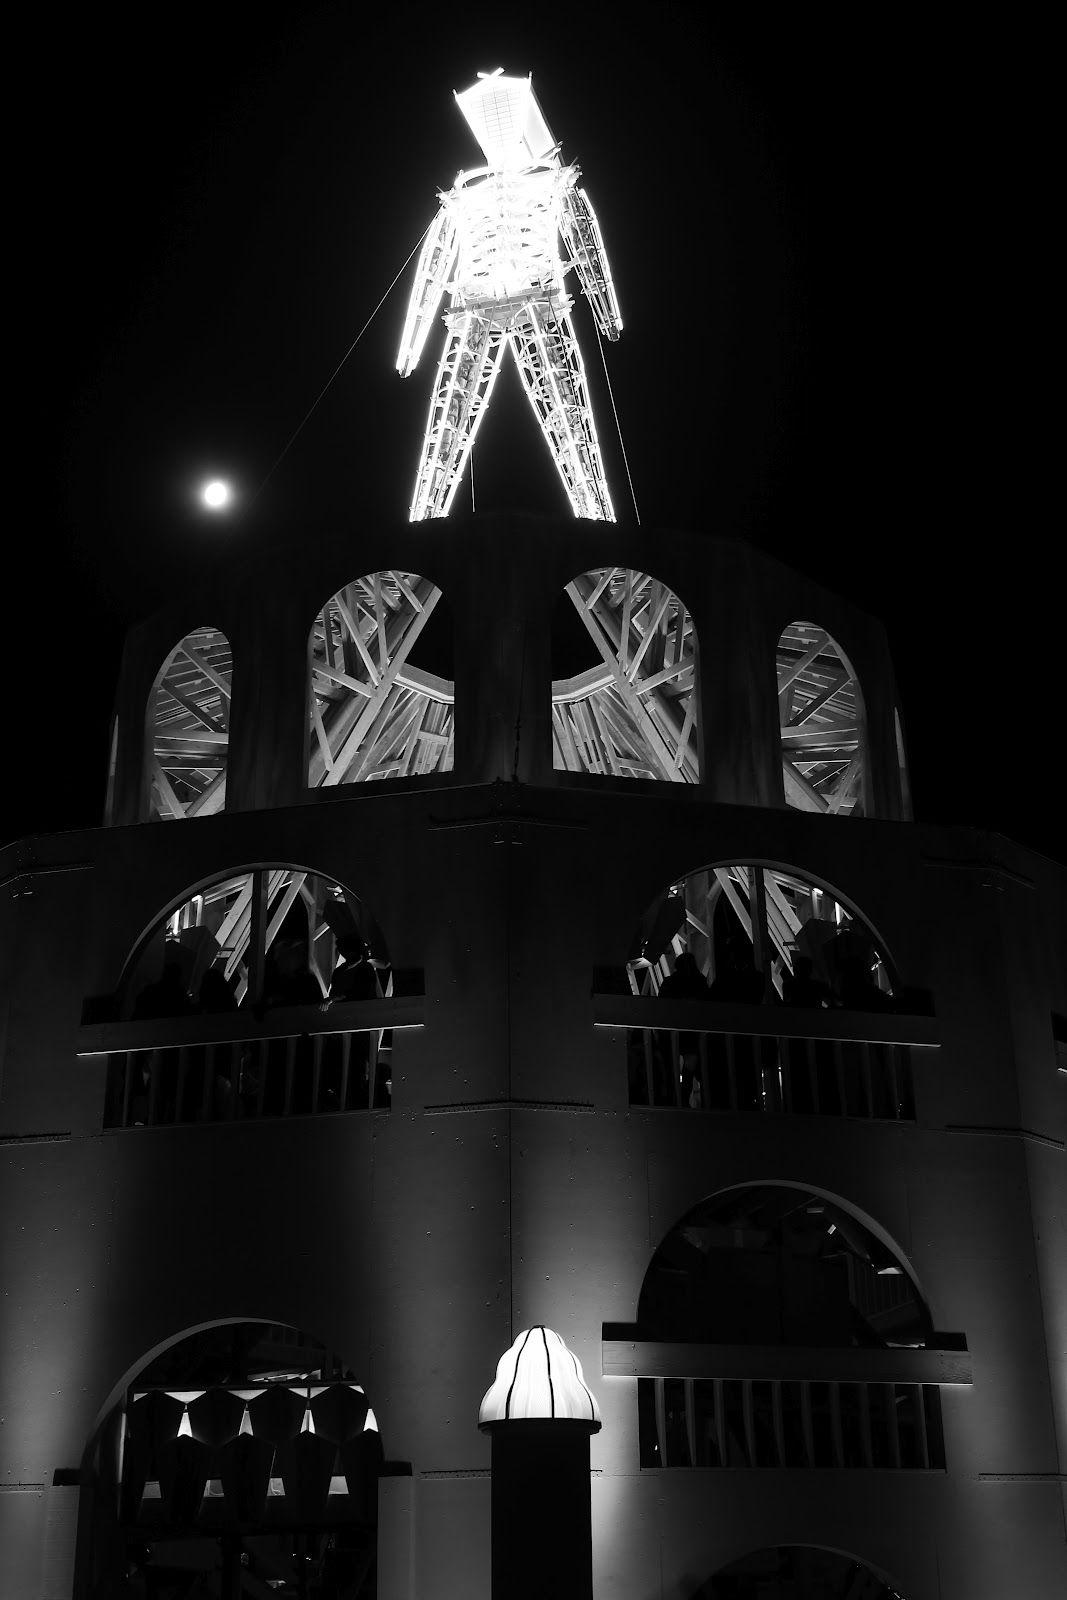 The Man  Scott Williams Photography - Kernville, California: Burning Man 2012 - Fertility 2.0